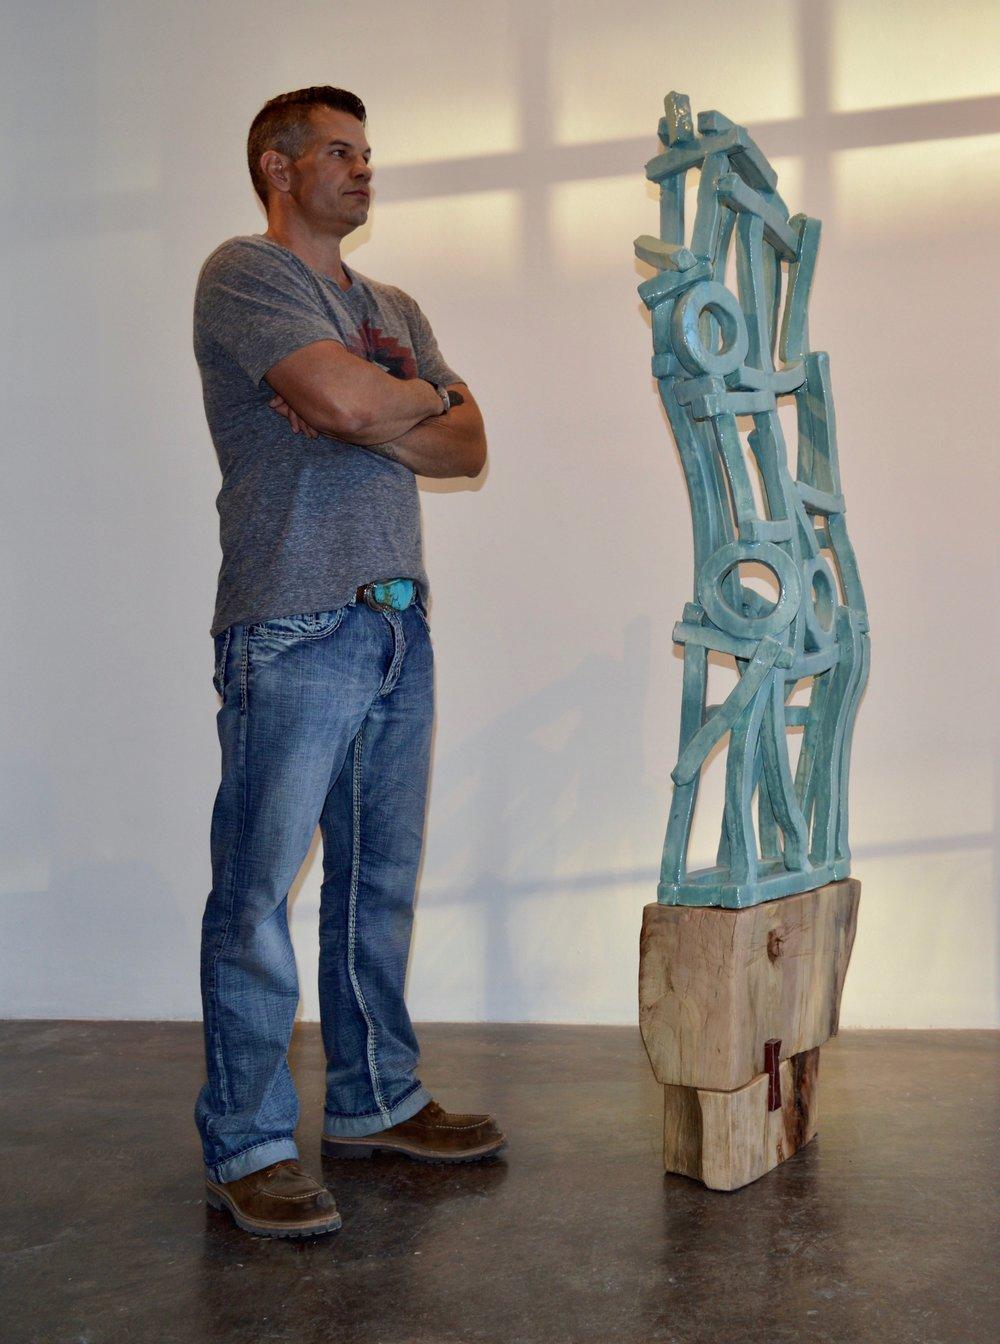 standingnearsculpture.jpg